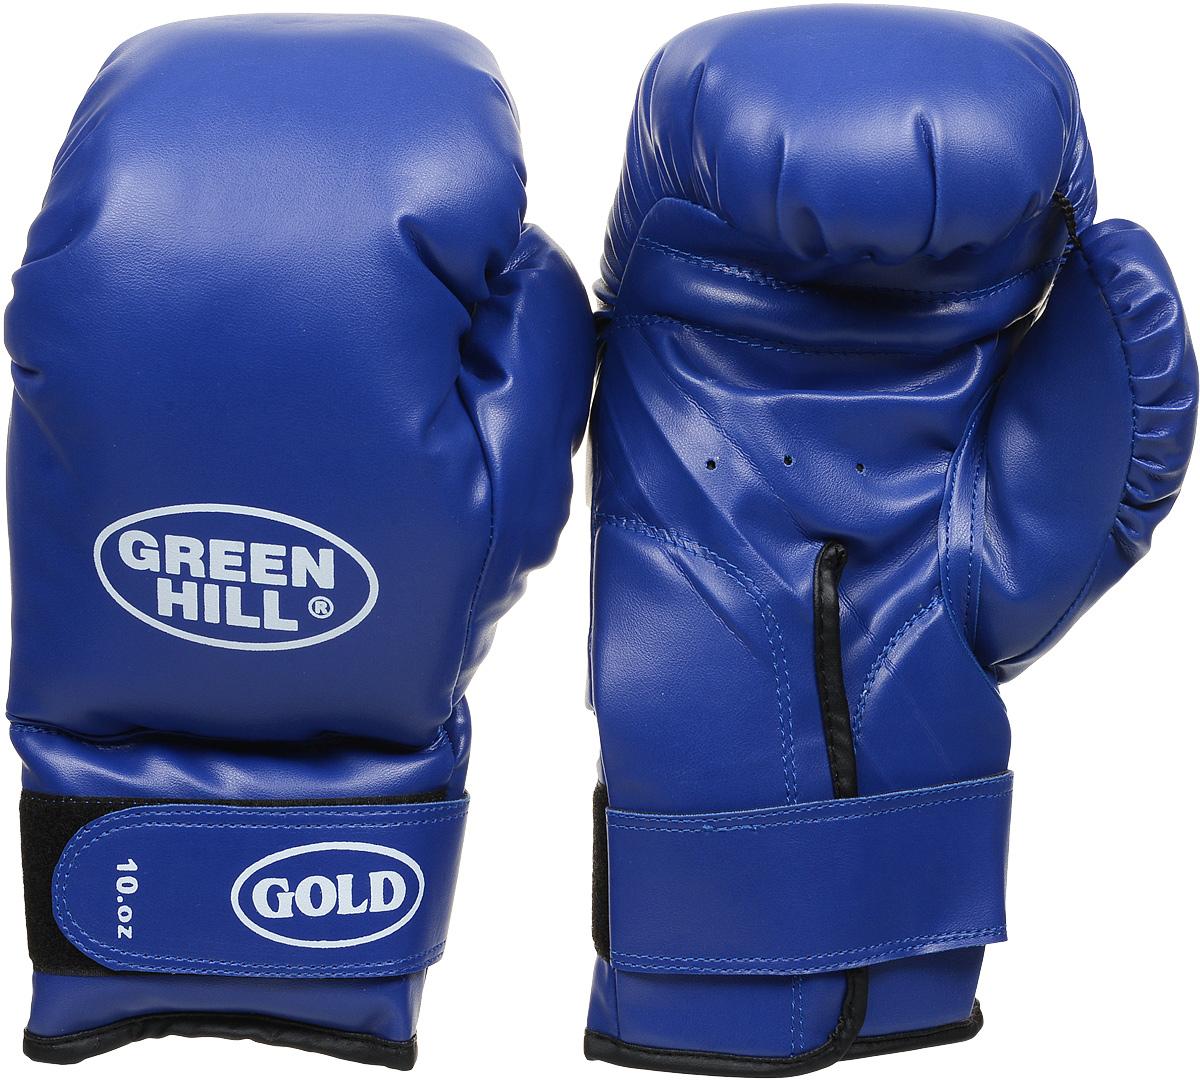 "Перчатки боксерские Green Hill ""Gold"", цвет: синий. Вес 10 унций"